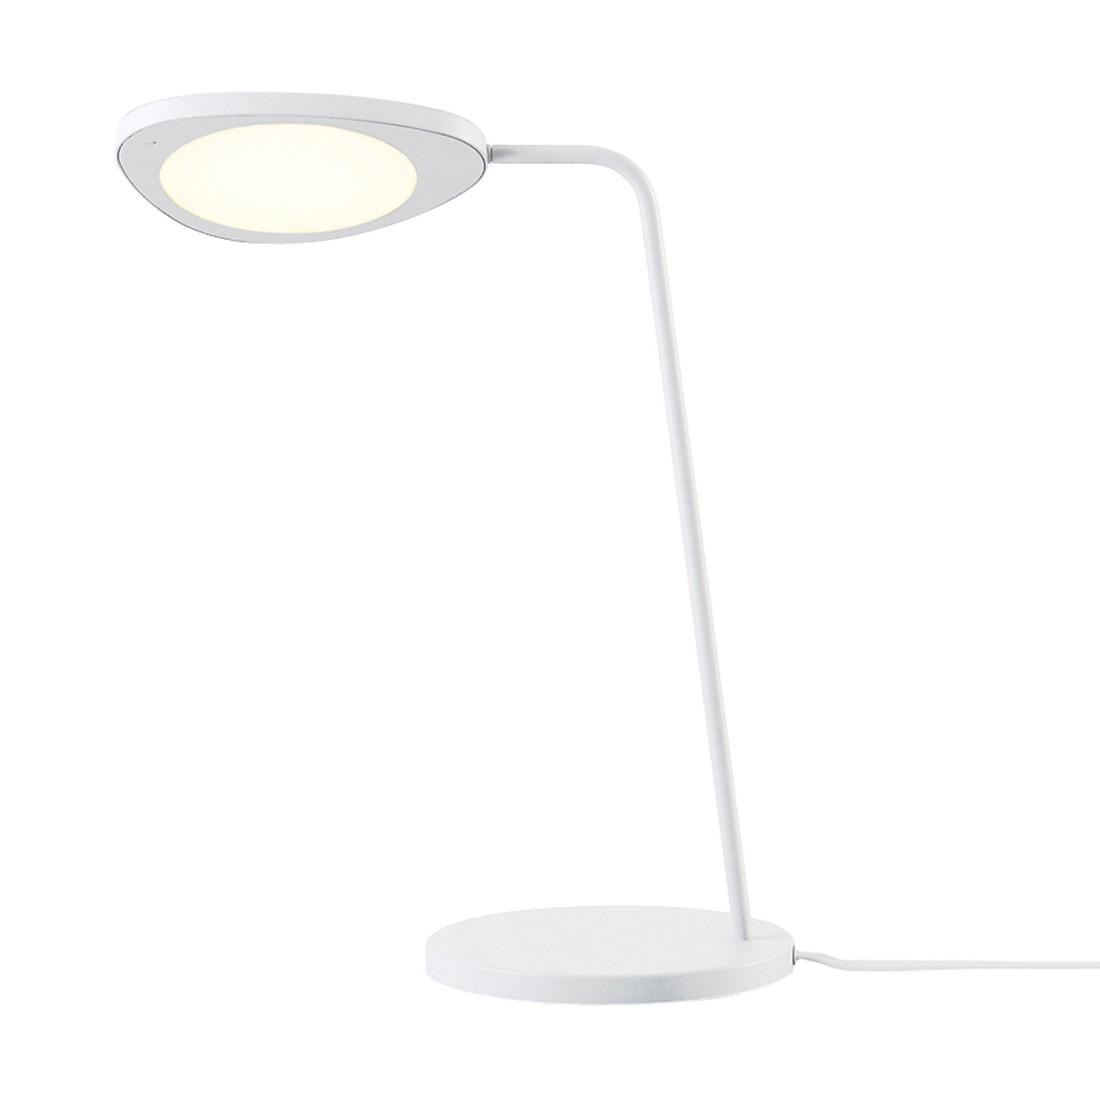 Tischleuchte Leaf LED ● Aluminium Weiß- Muuto